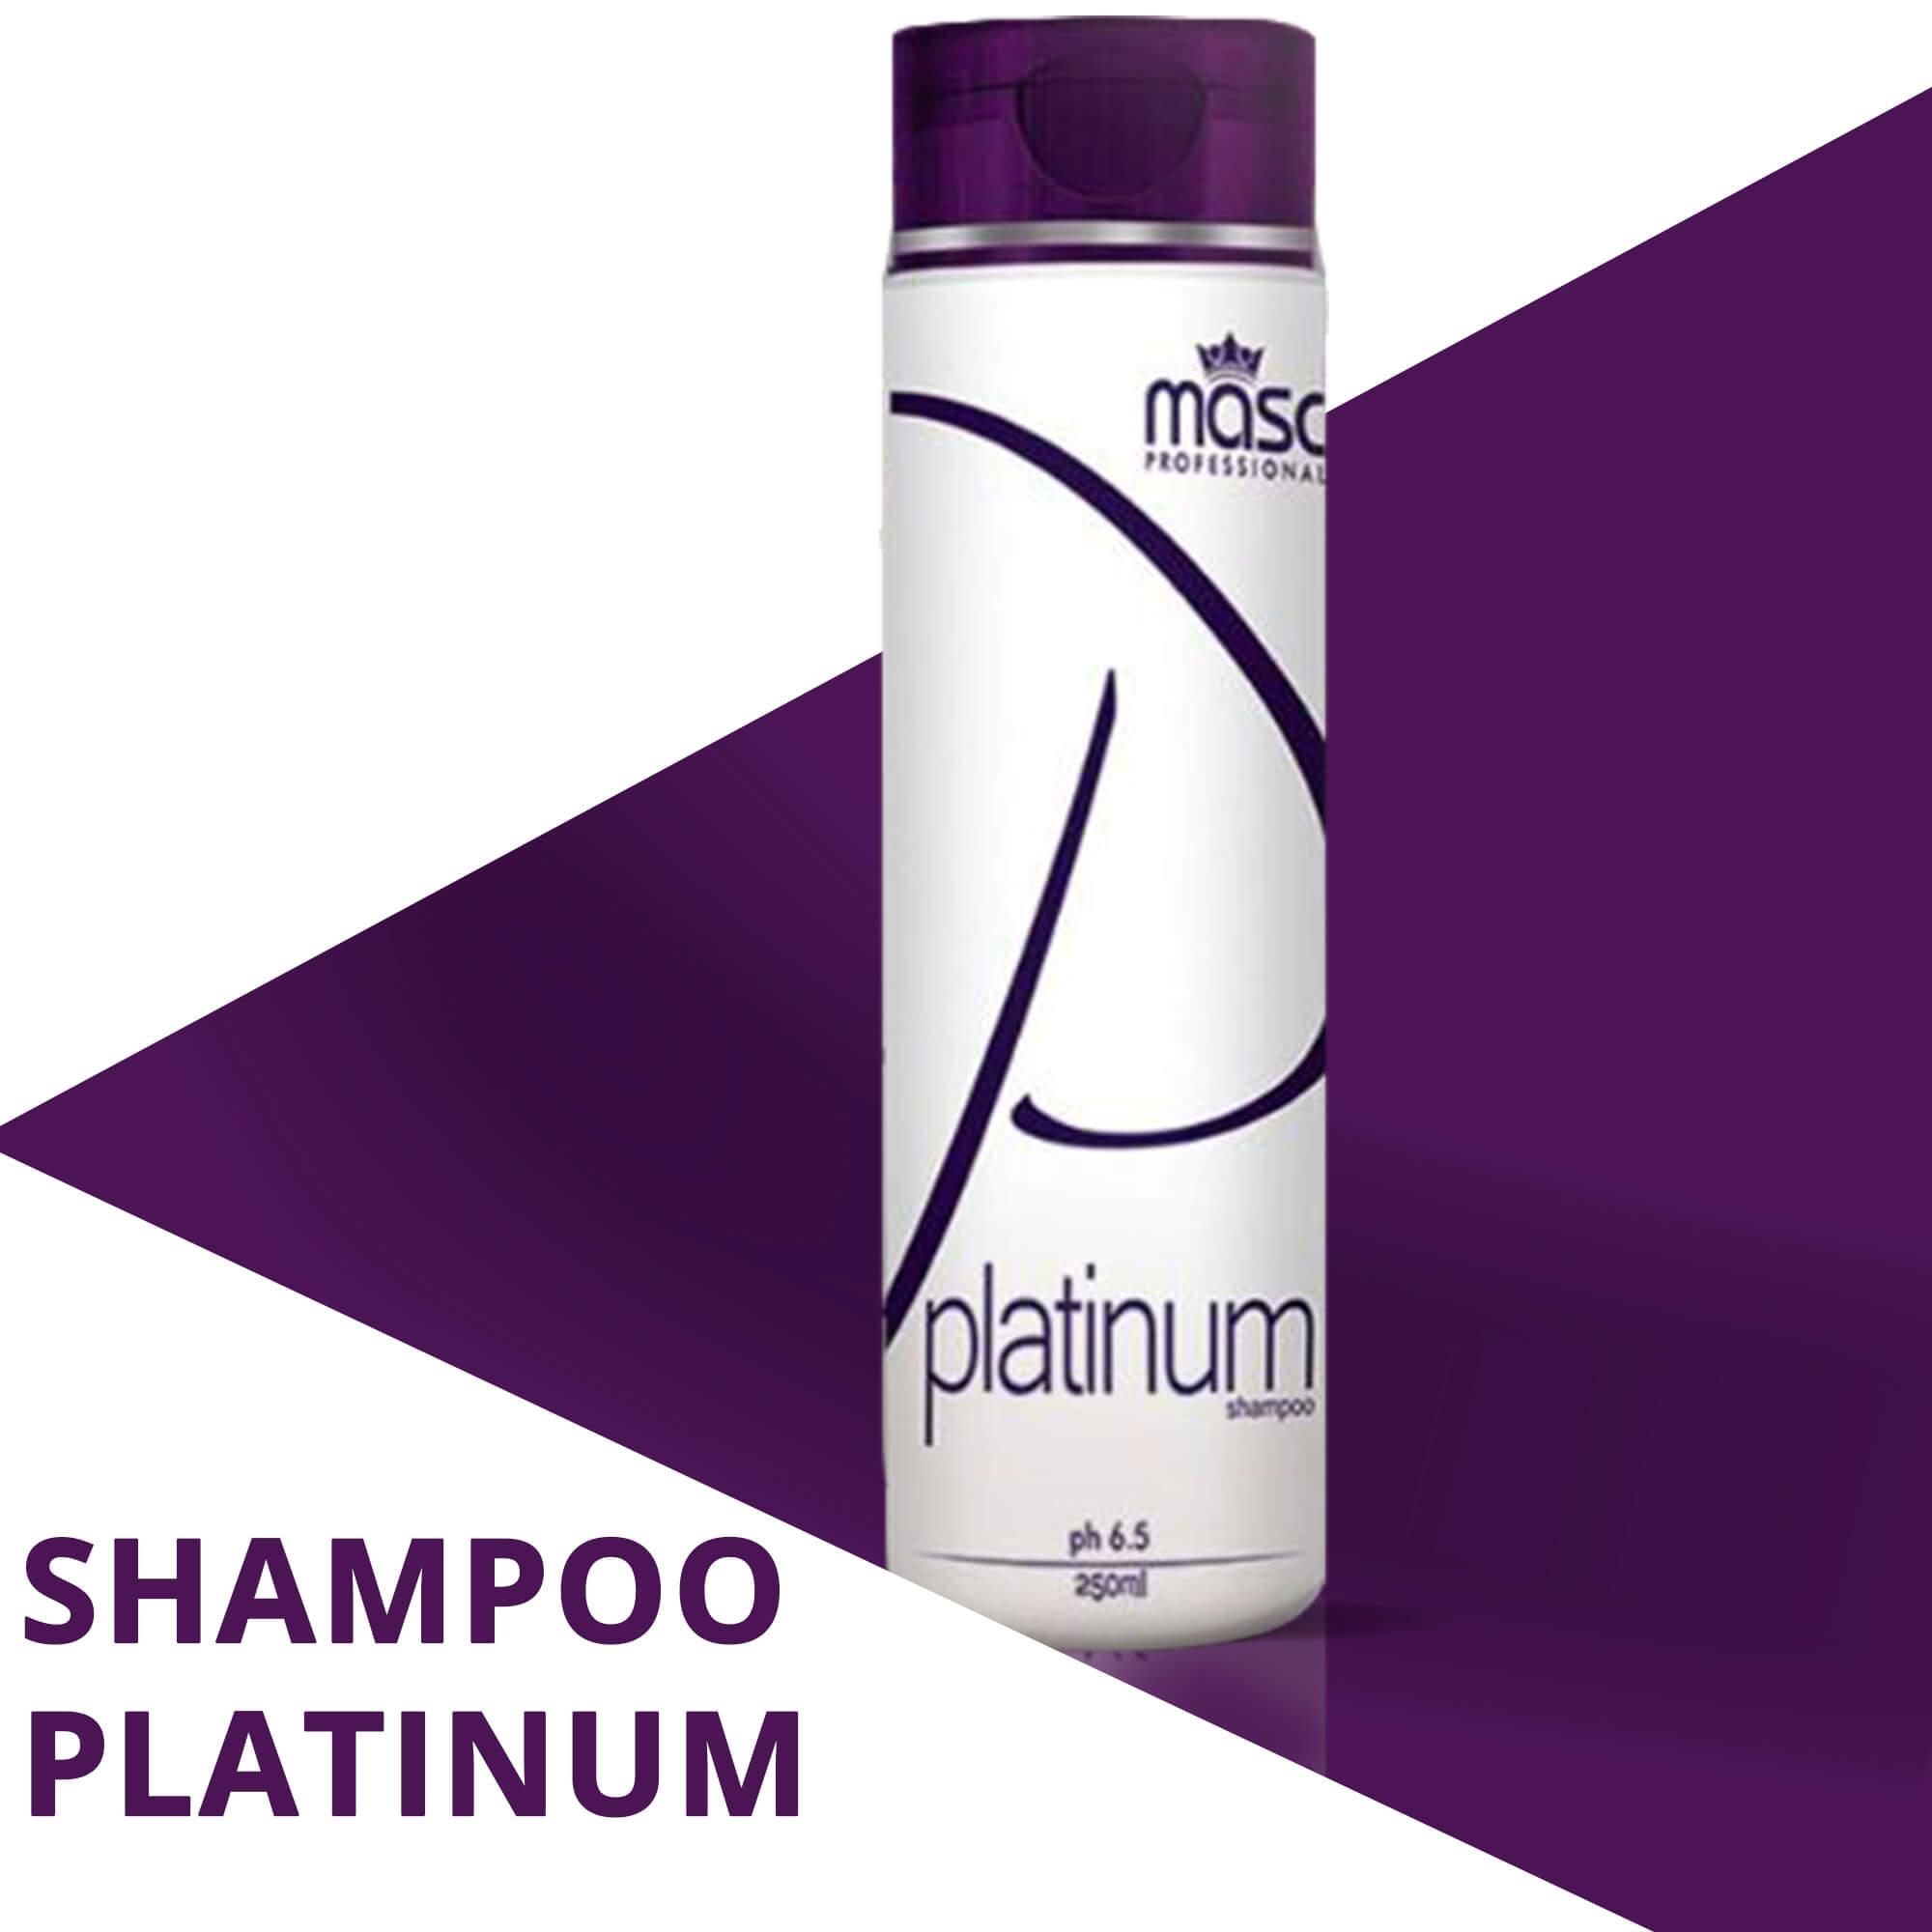 Shampoo Platinum Masc Professional 250g